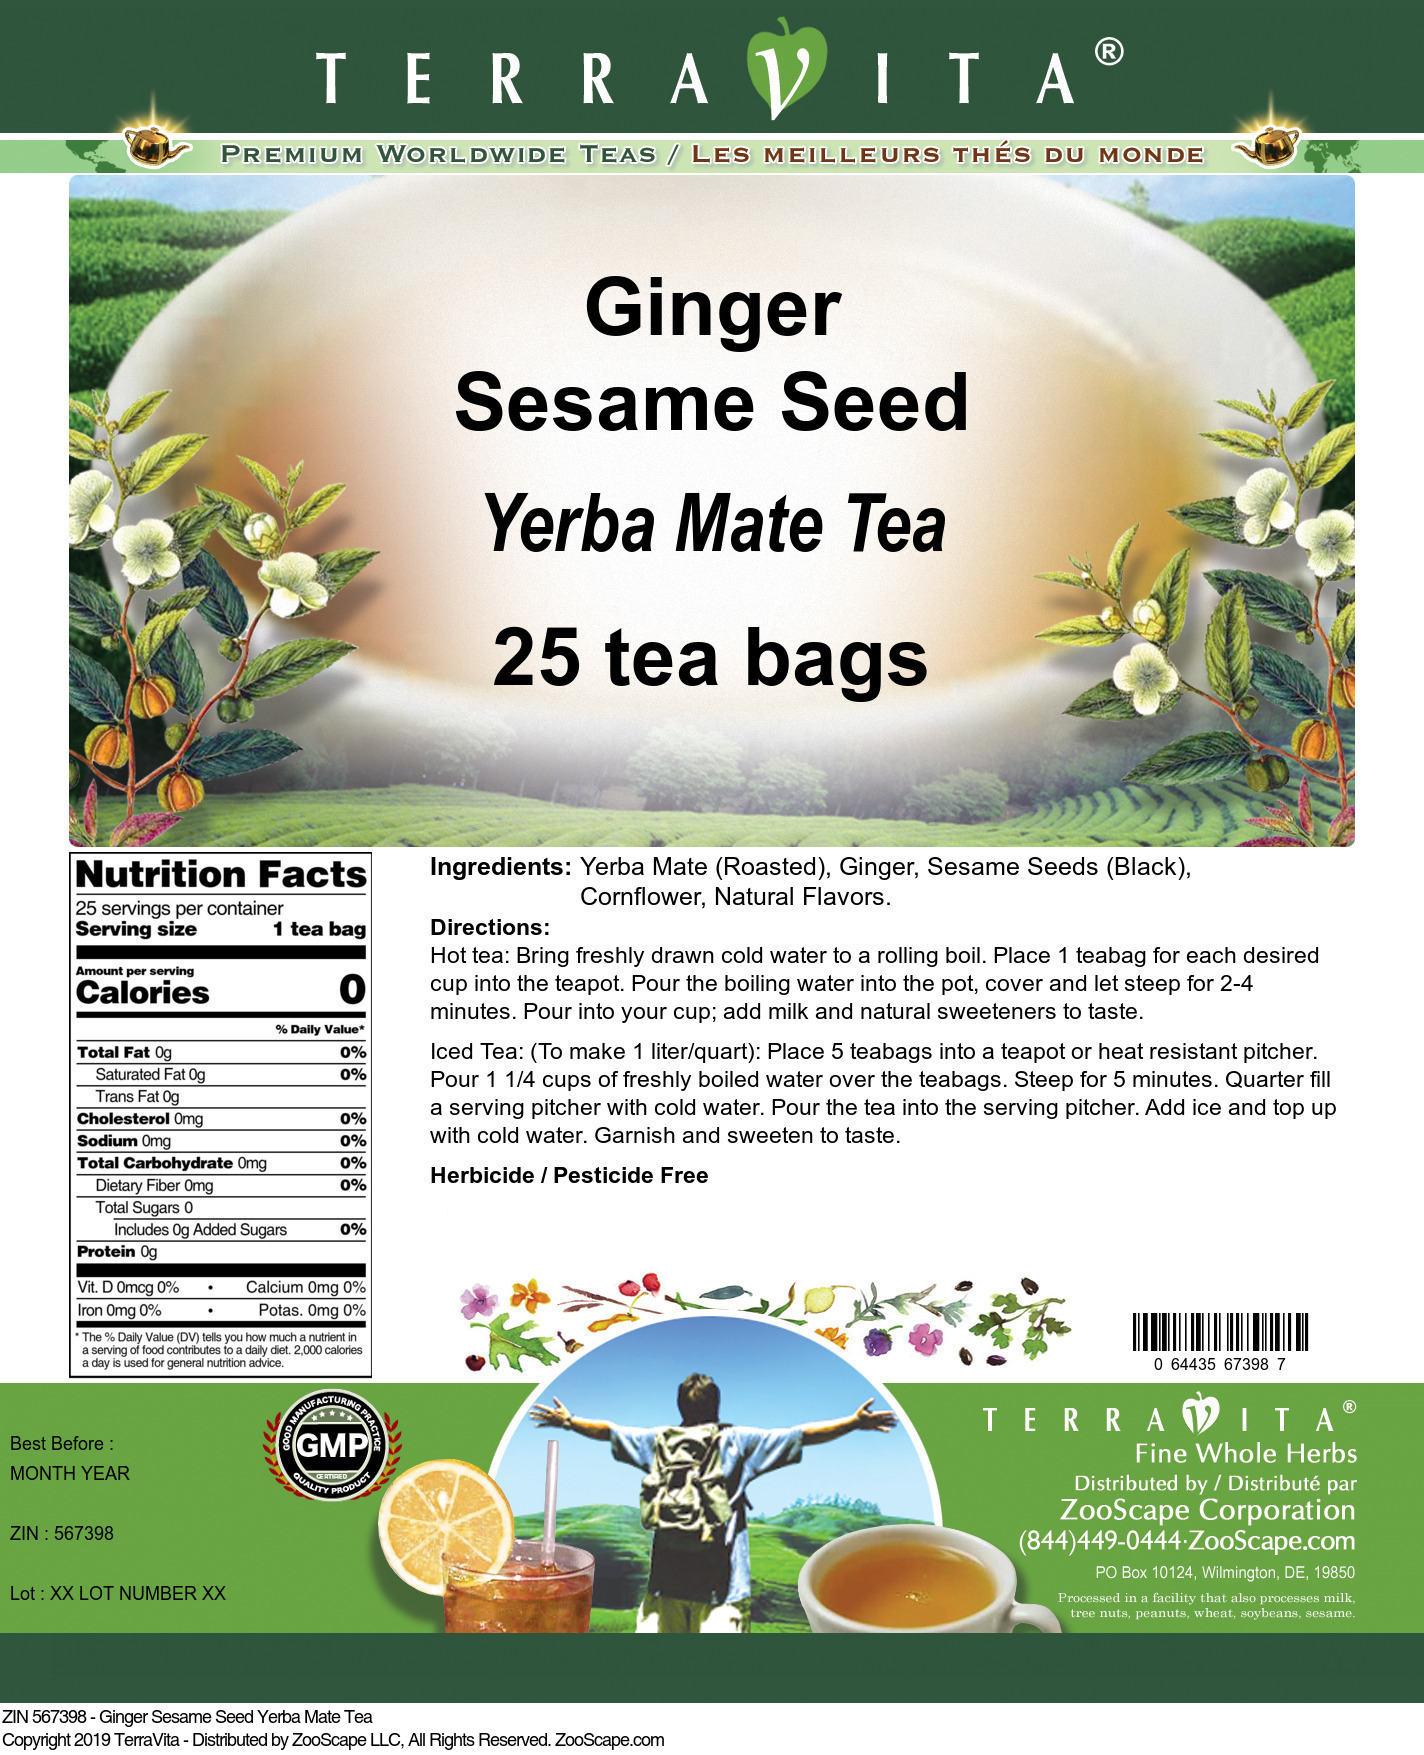 Ginger Sesame Seed Yerba Mate